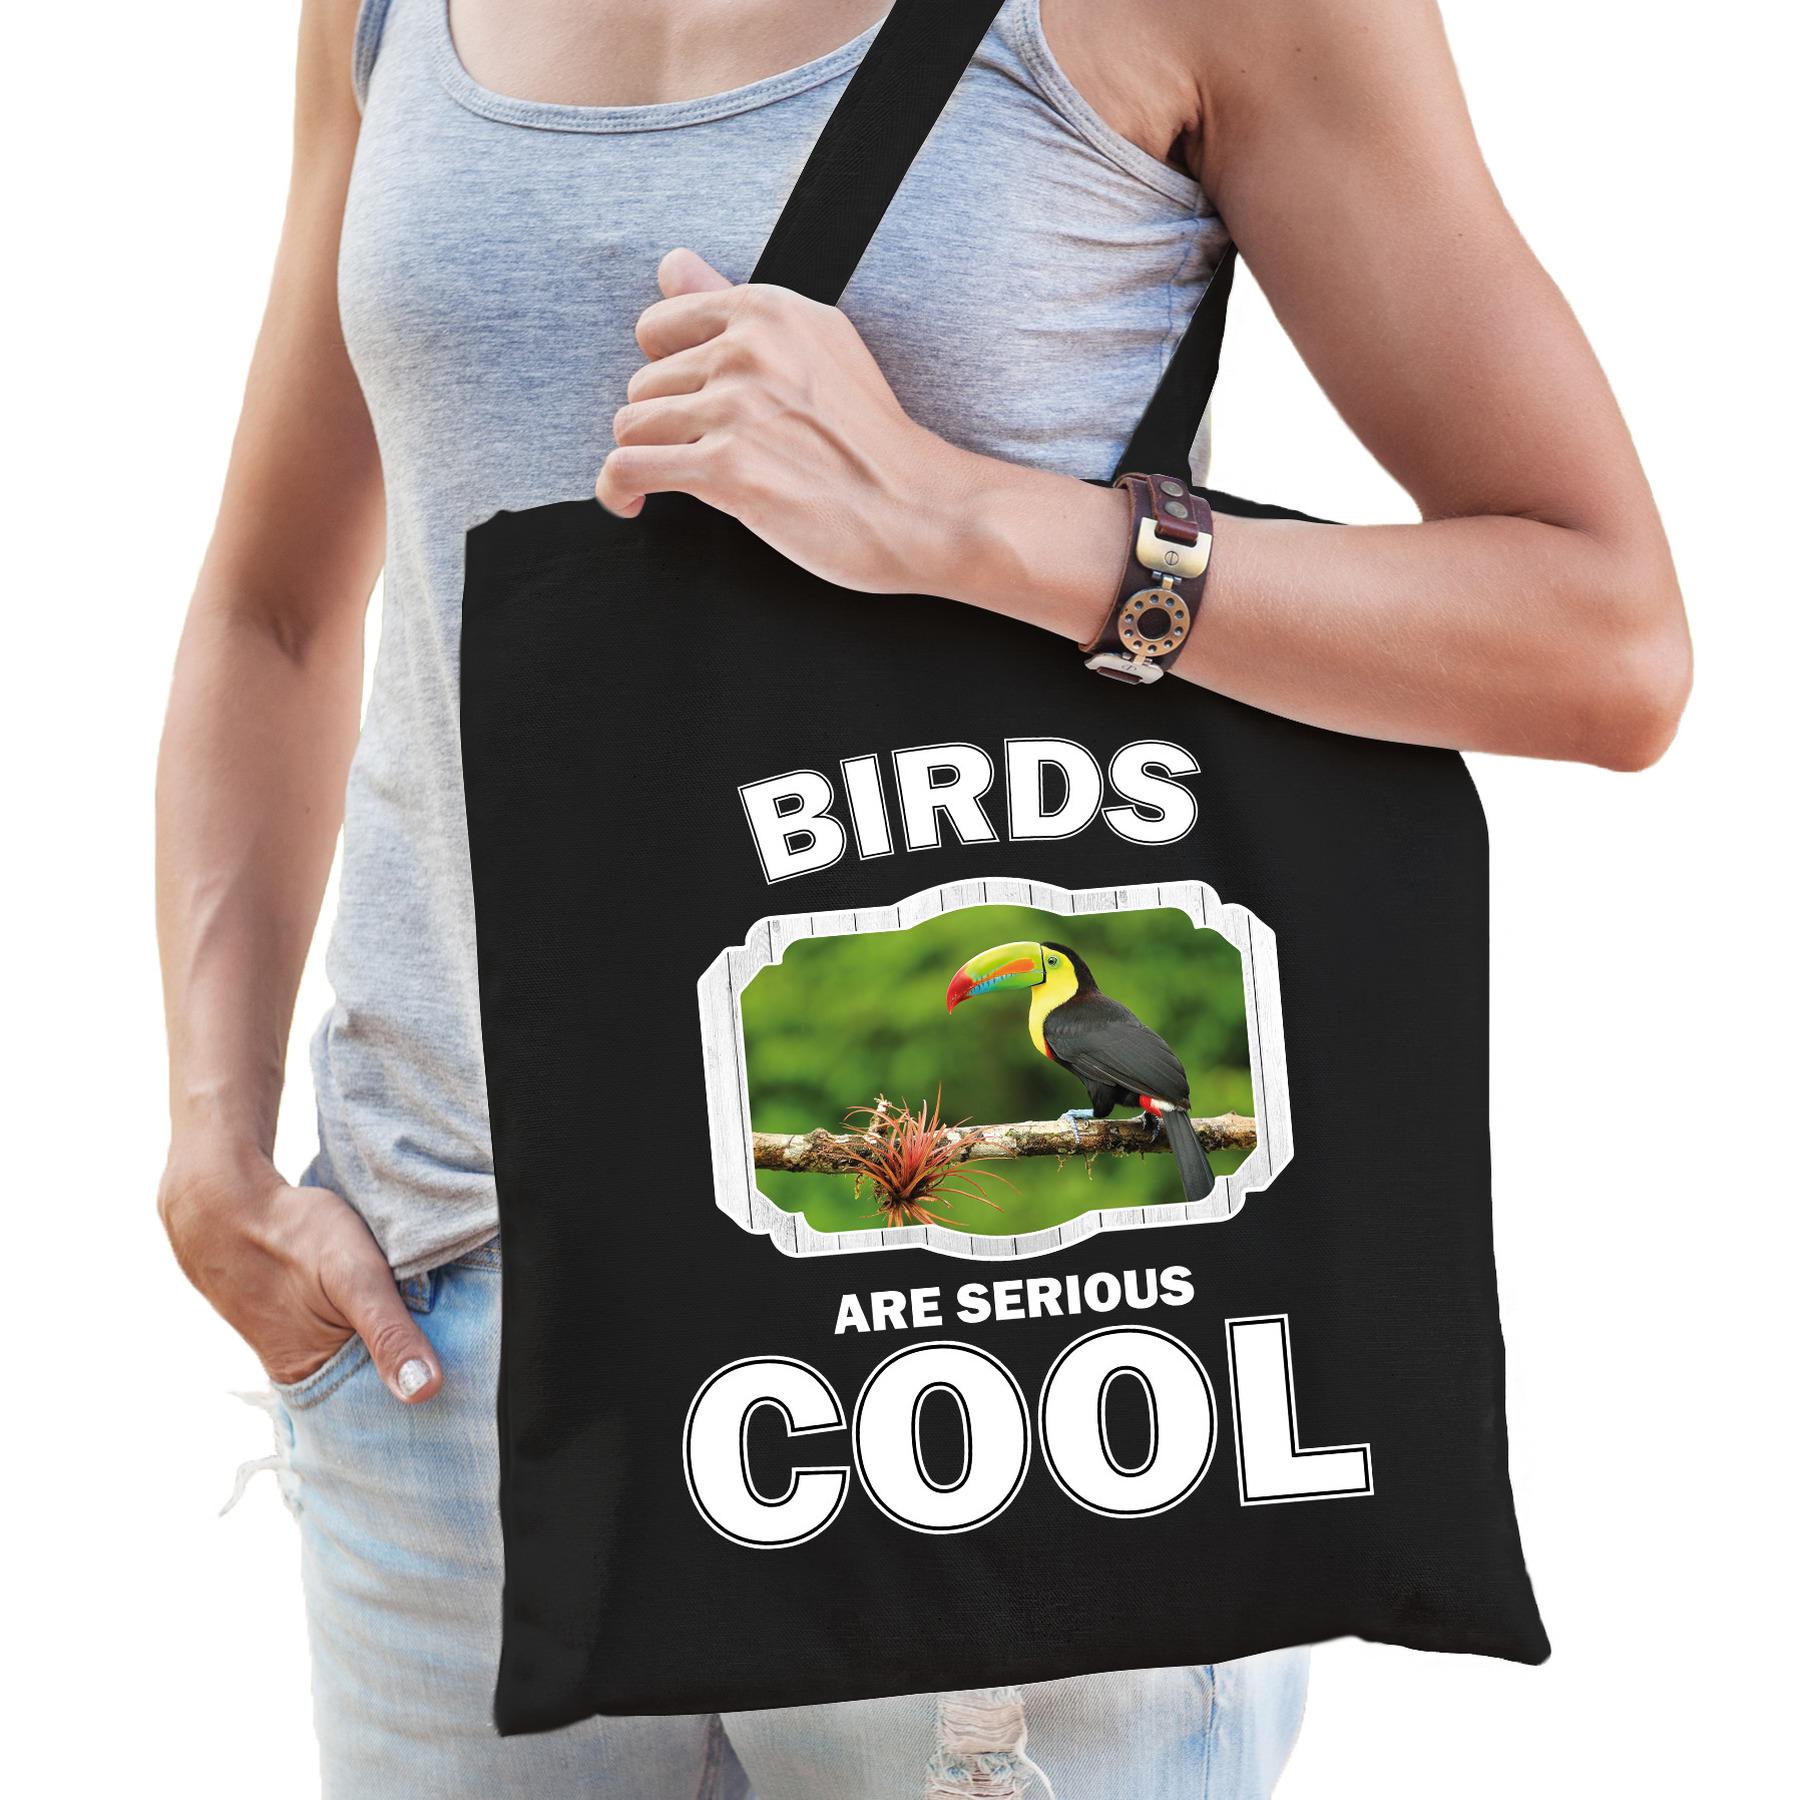 Katoenen tasje birds are serious cool zwart - toekans/ toekan cadeau tas